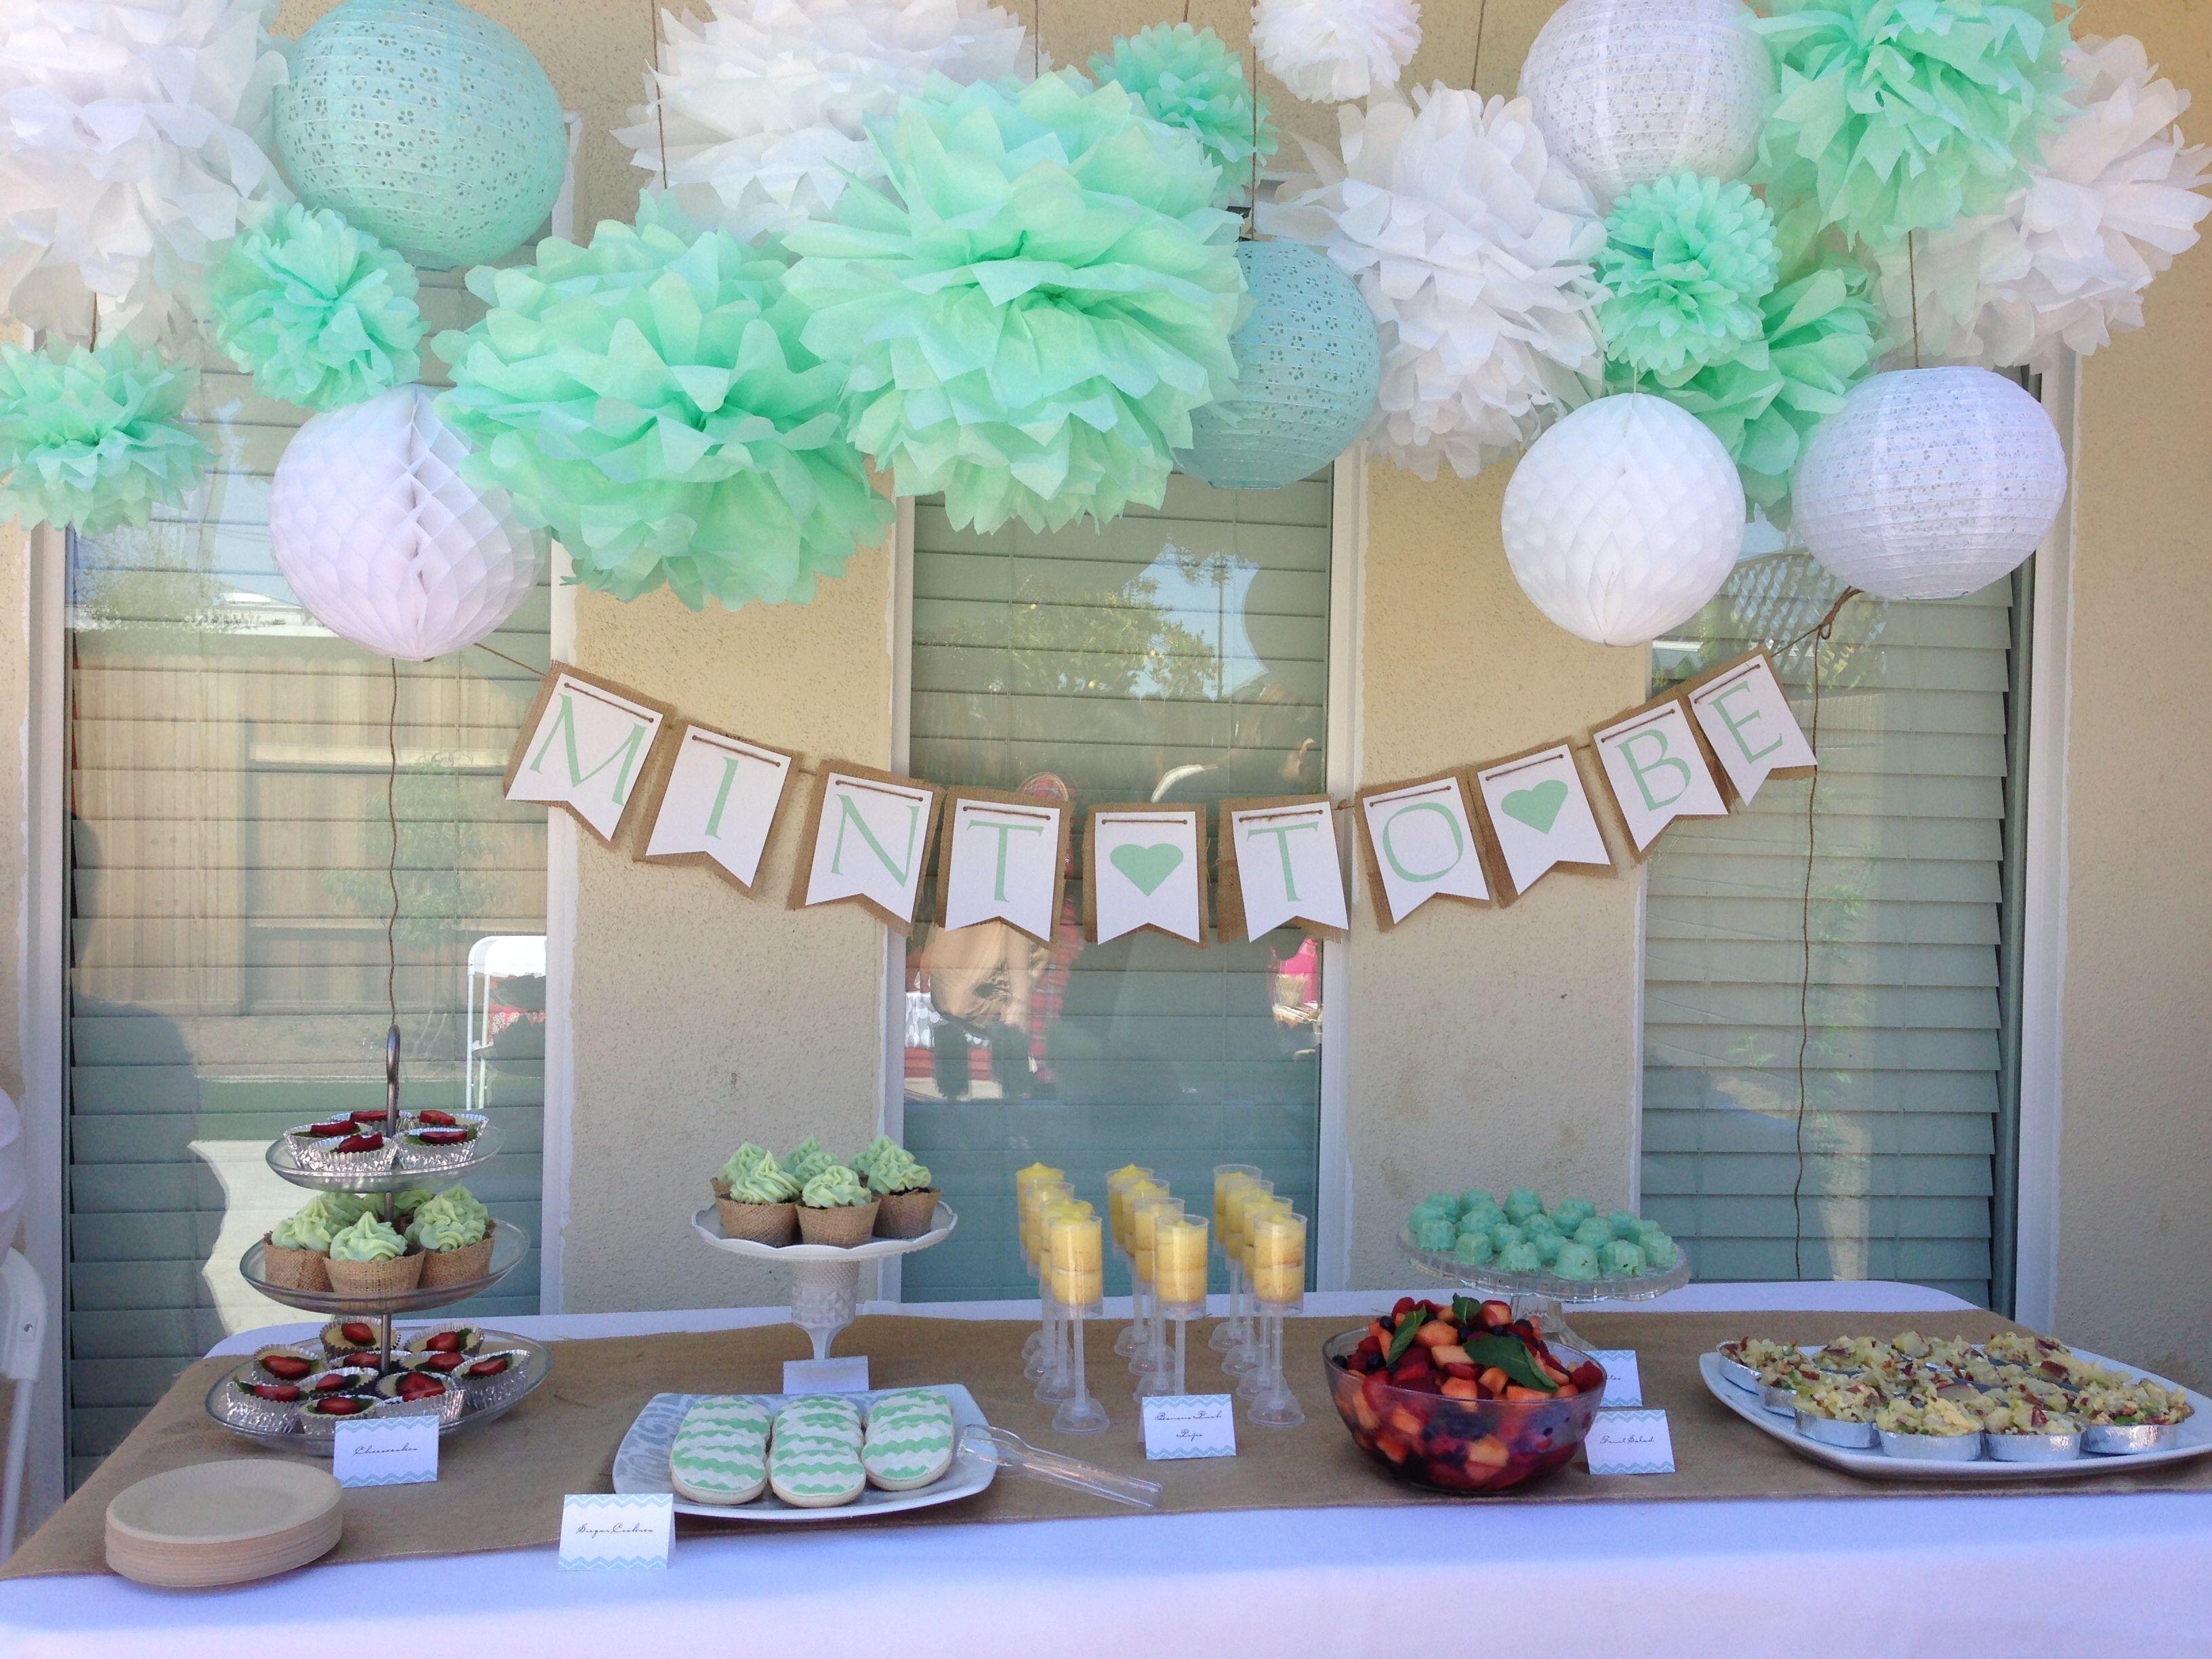 neutrals 5 tissue paper pom poms wedding decoration.htm bridal shower mint to be  tissue paper pom decorations and  bridal shower mint to be  tissue paper